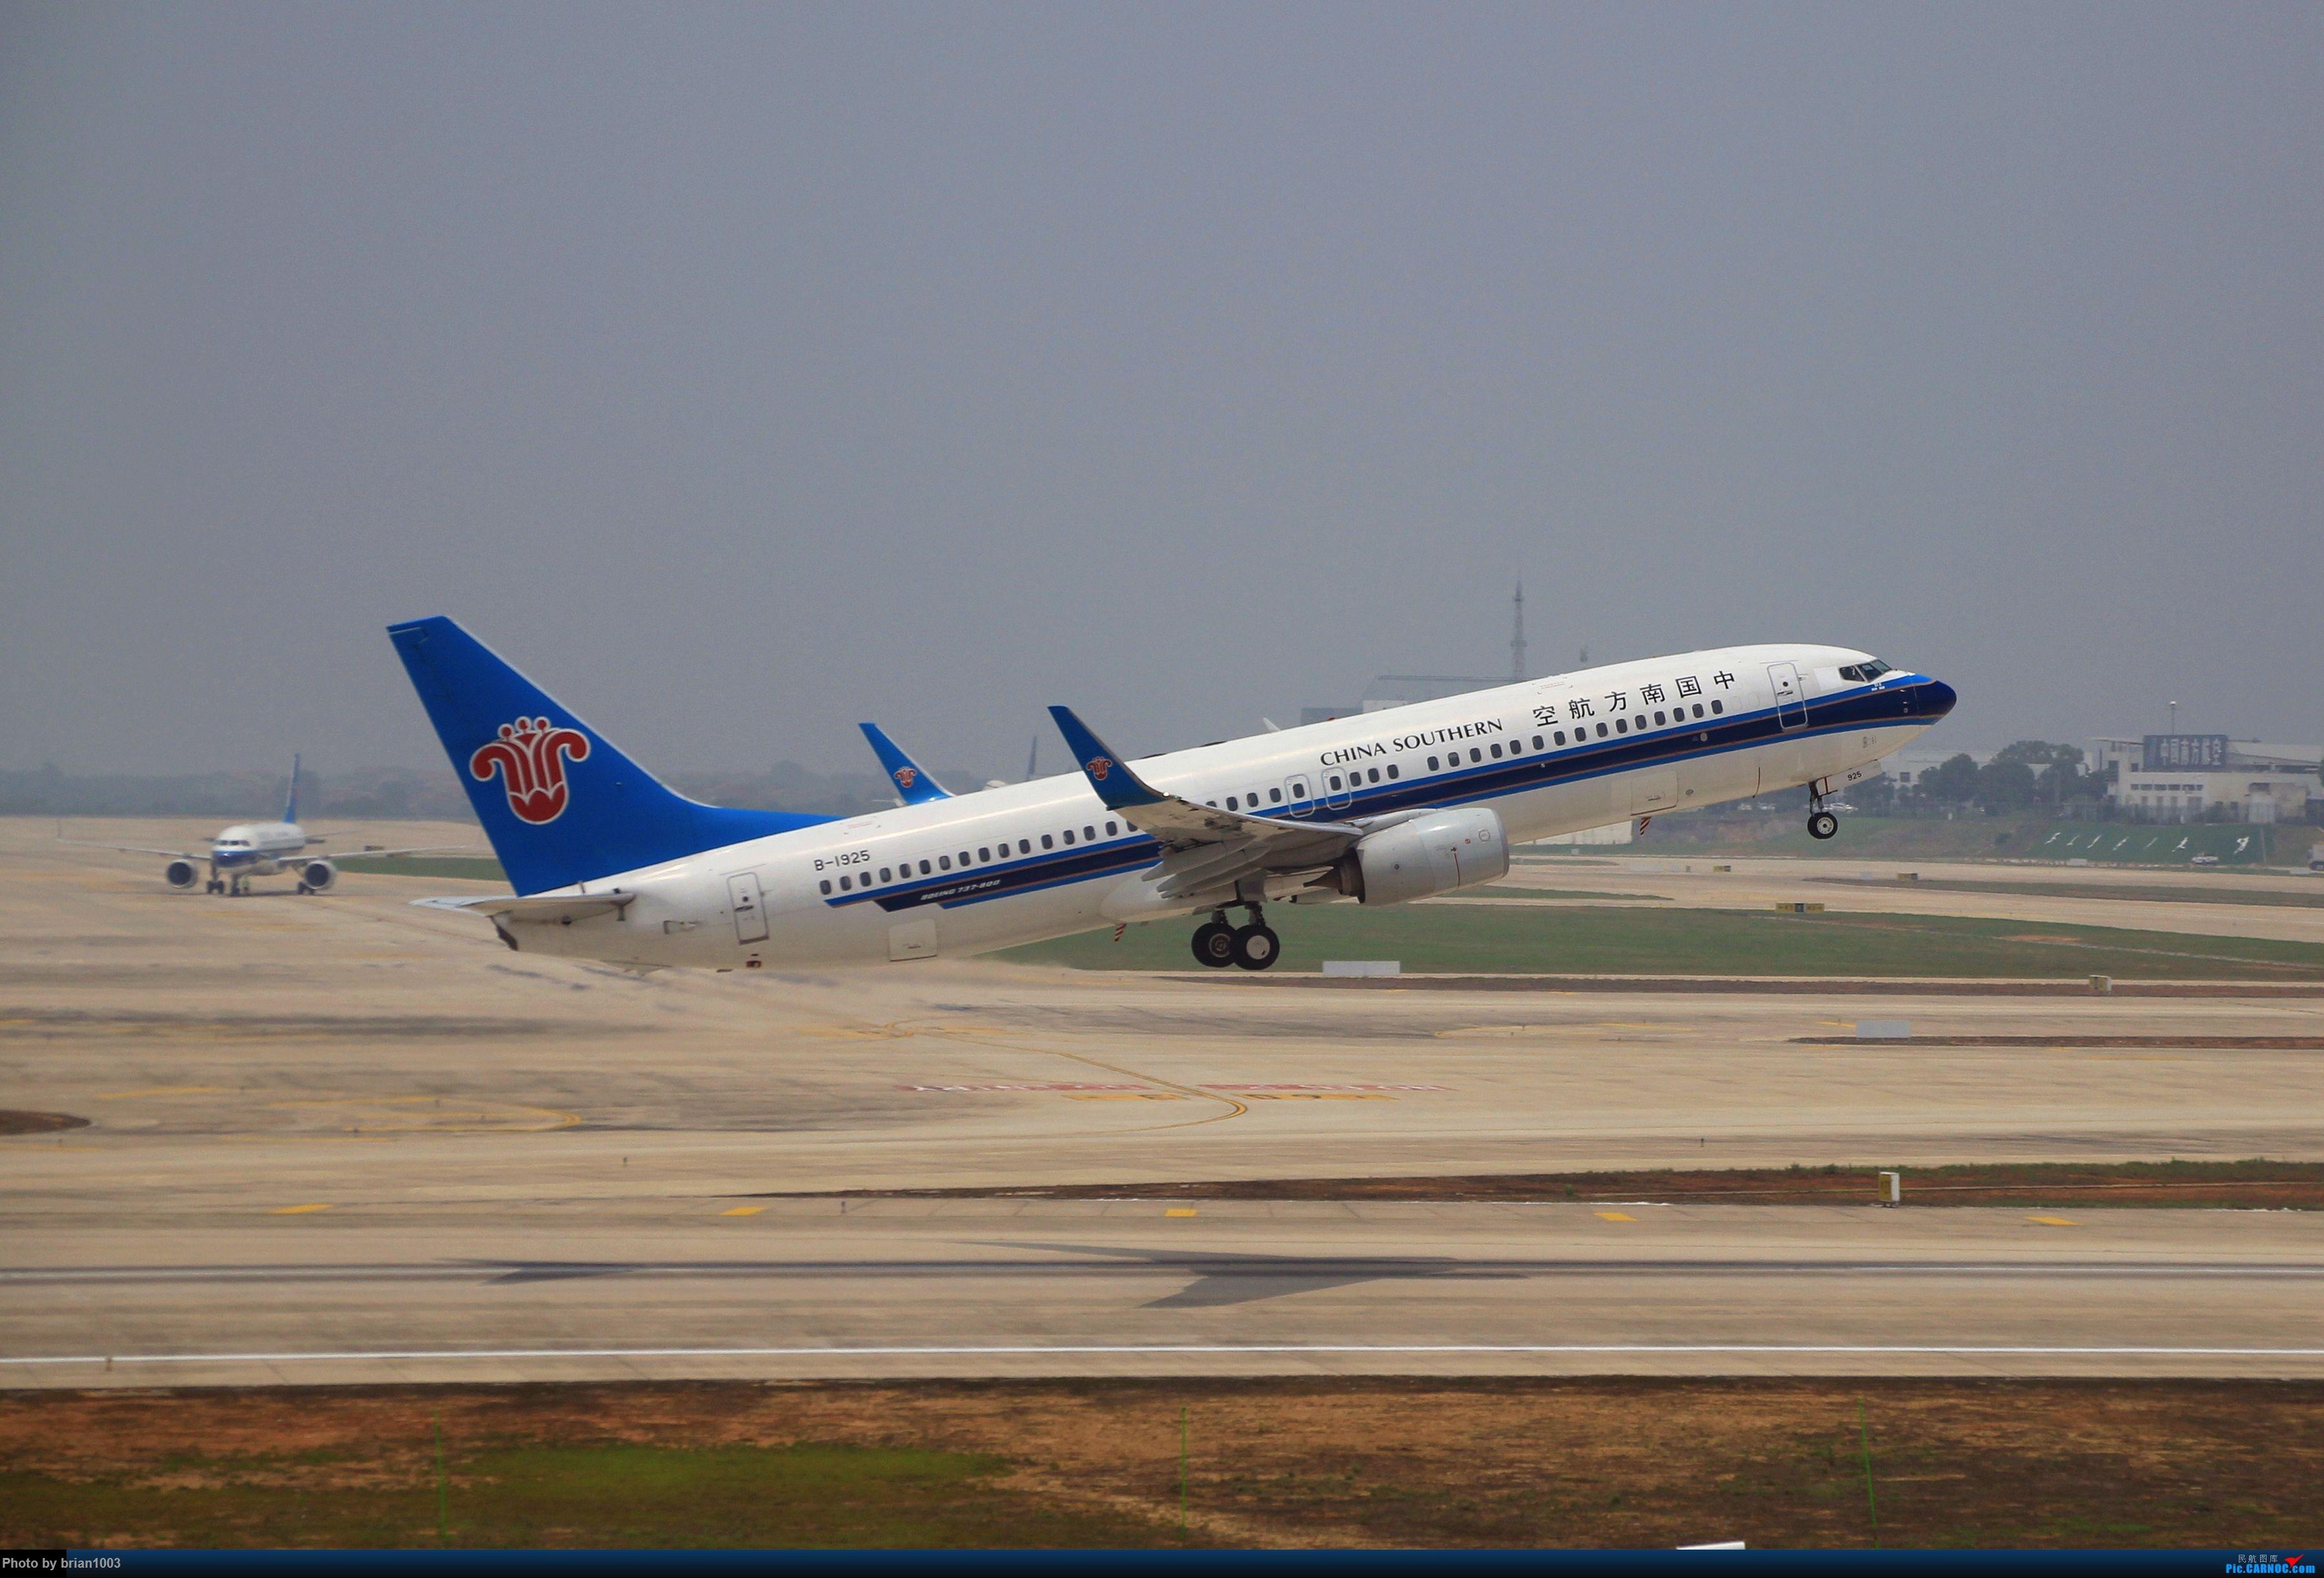 Re:[原创]WUH武汉天河机场拍机之二跑最后忙碌时 BOEING 737-800 B-1925 中国武汉天河国际机场